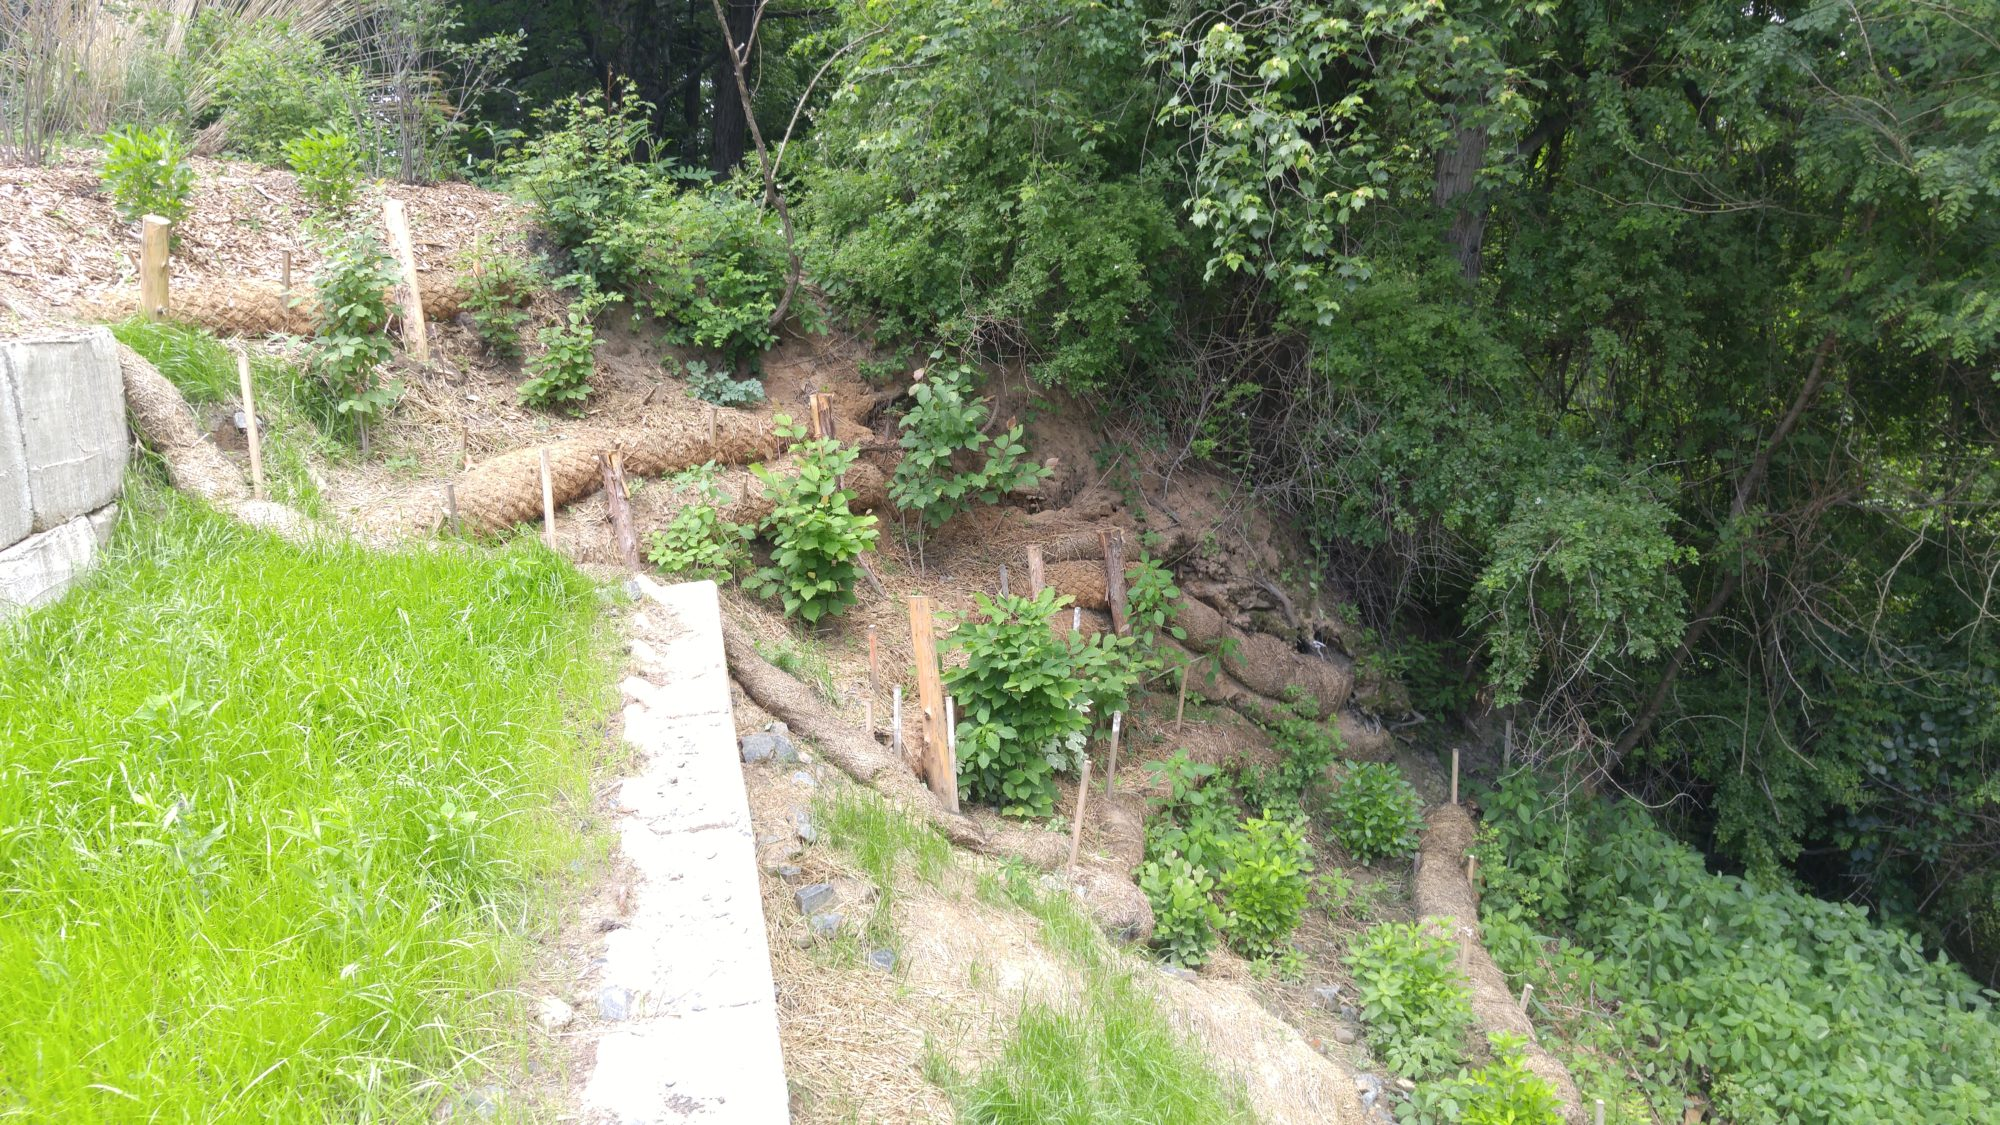 slope stabilization and wetland protection regenerative design